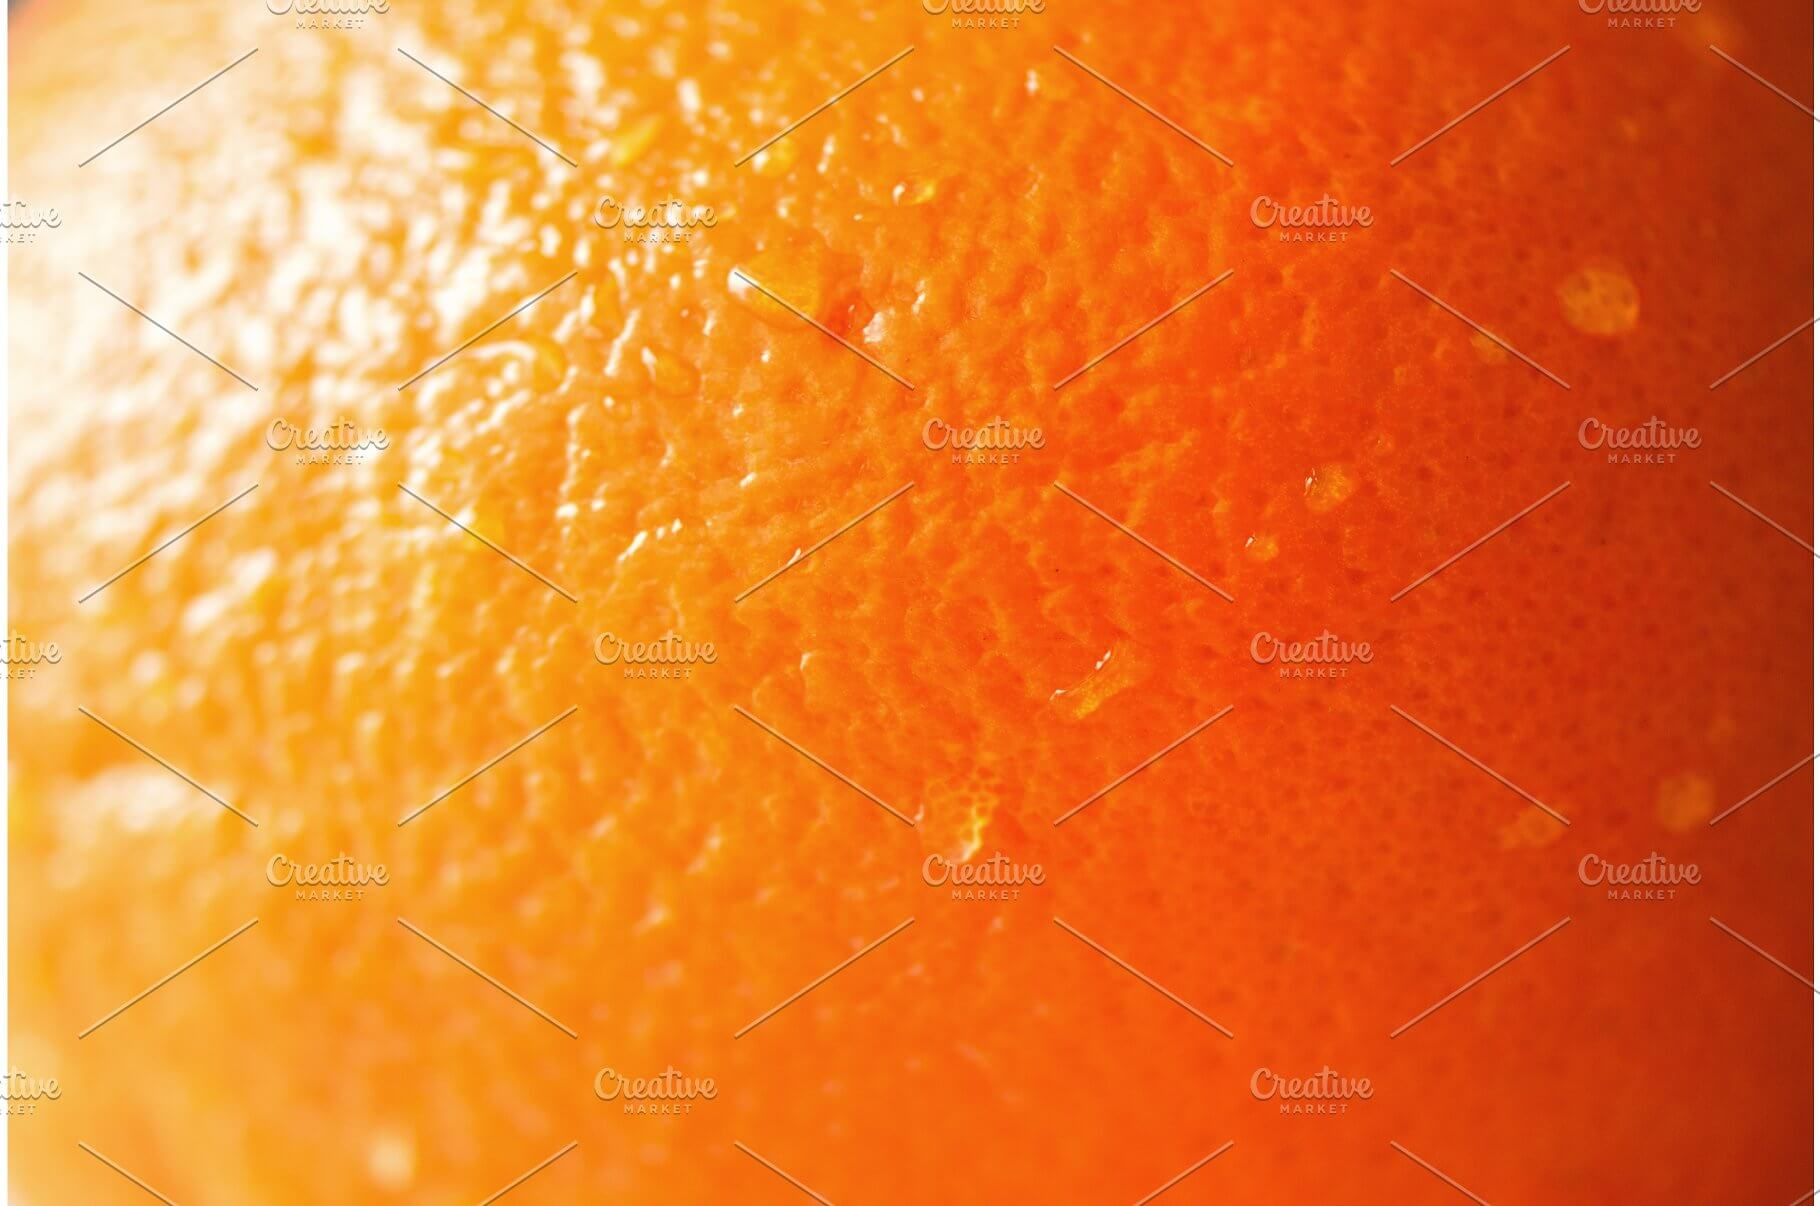 Texture of fresh bright orange peel2 (1)